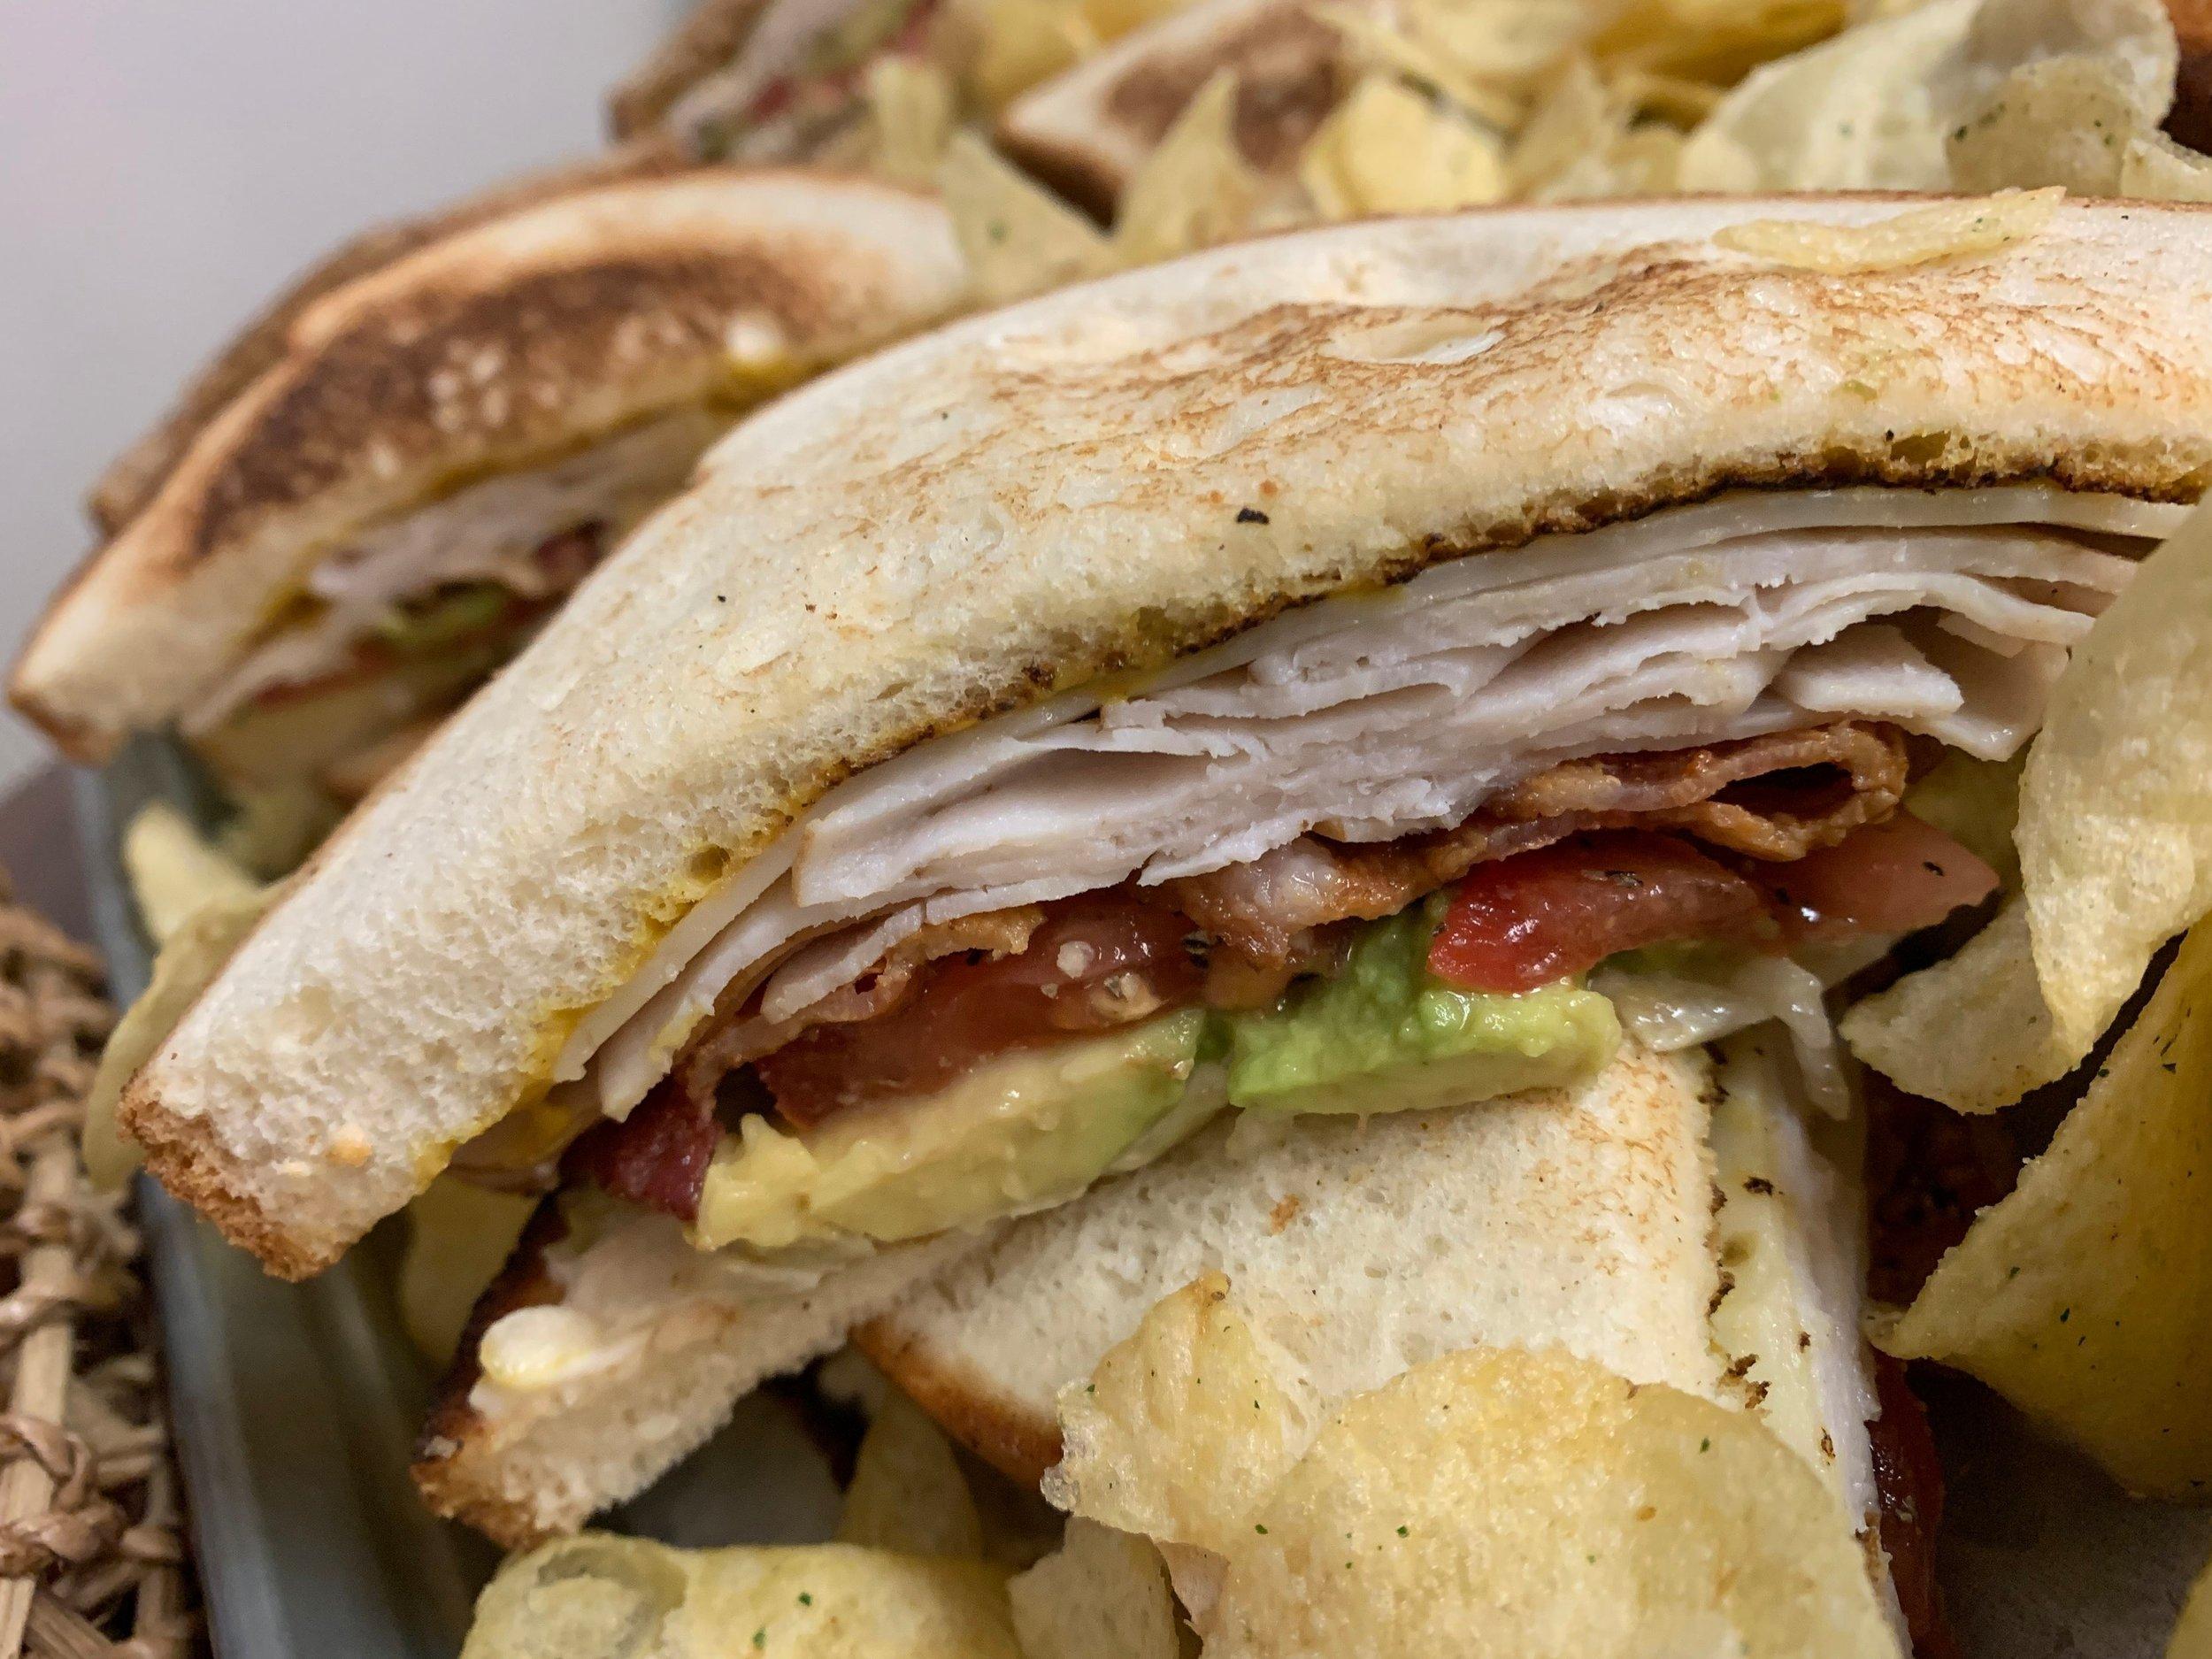 turkey+sandwich+lunchbox.jpeg